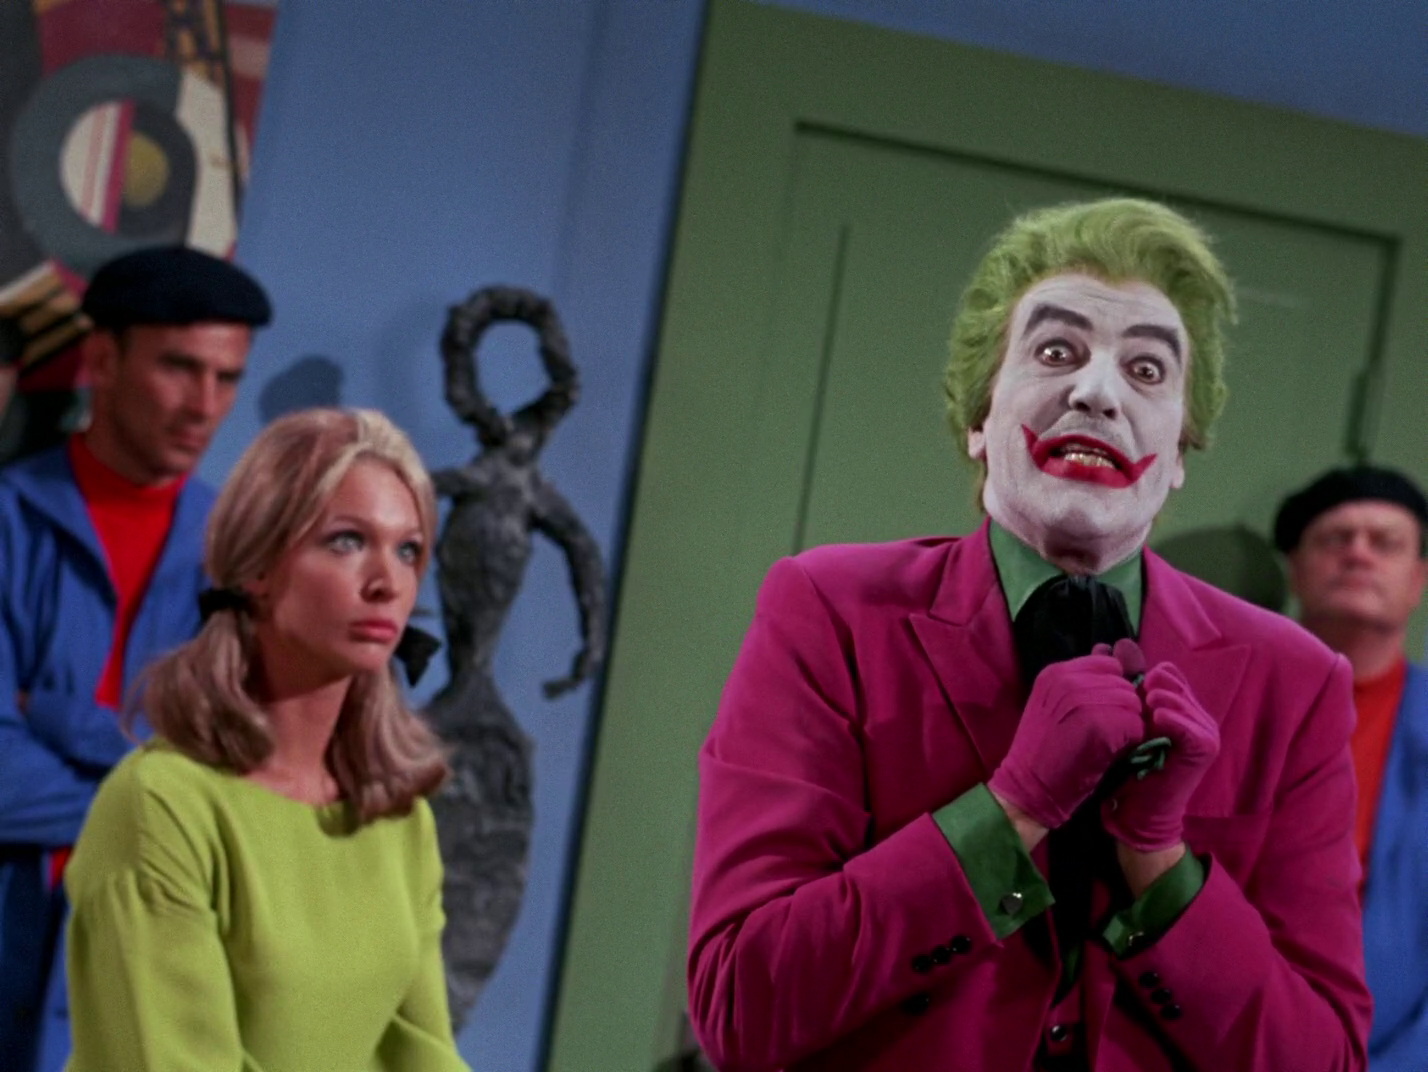 Batman,  Flop Goes the Joker   Episode aired 23 March 1967 Season 2   Episode 58, Cesar Romero. The Joker